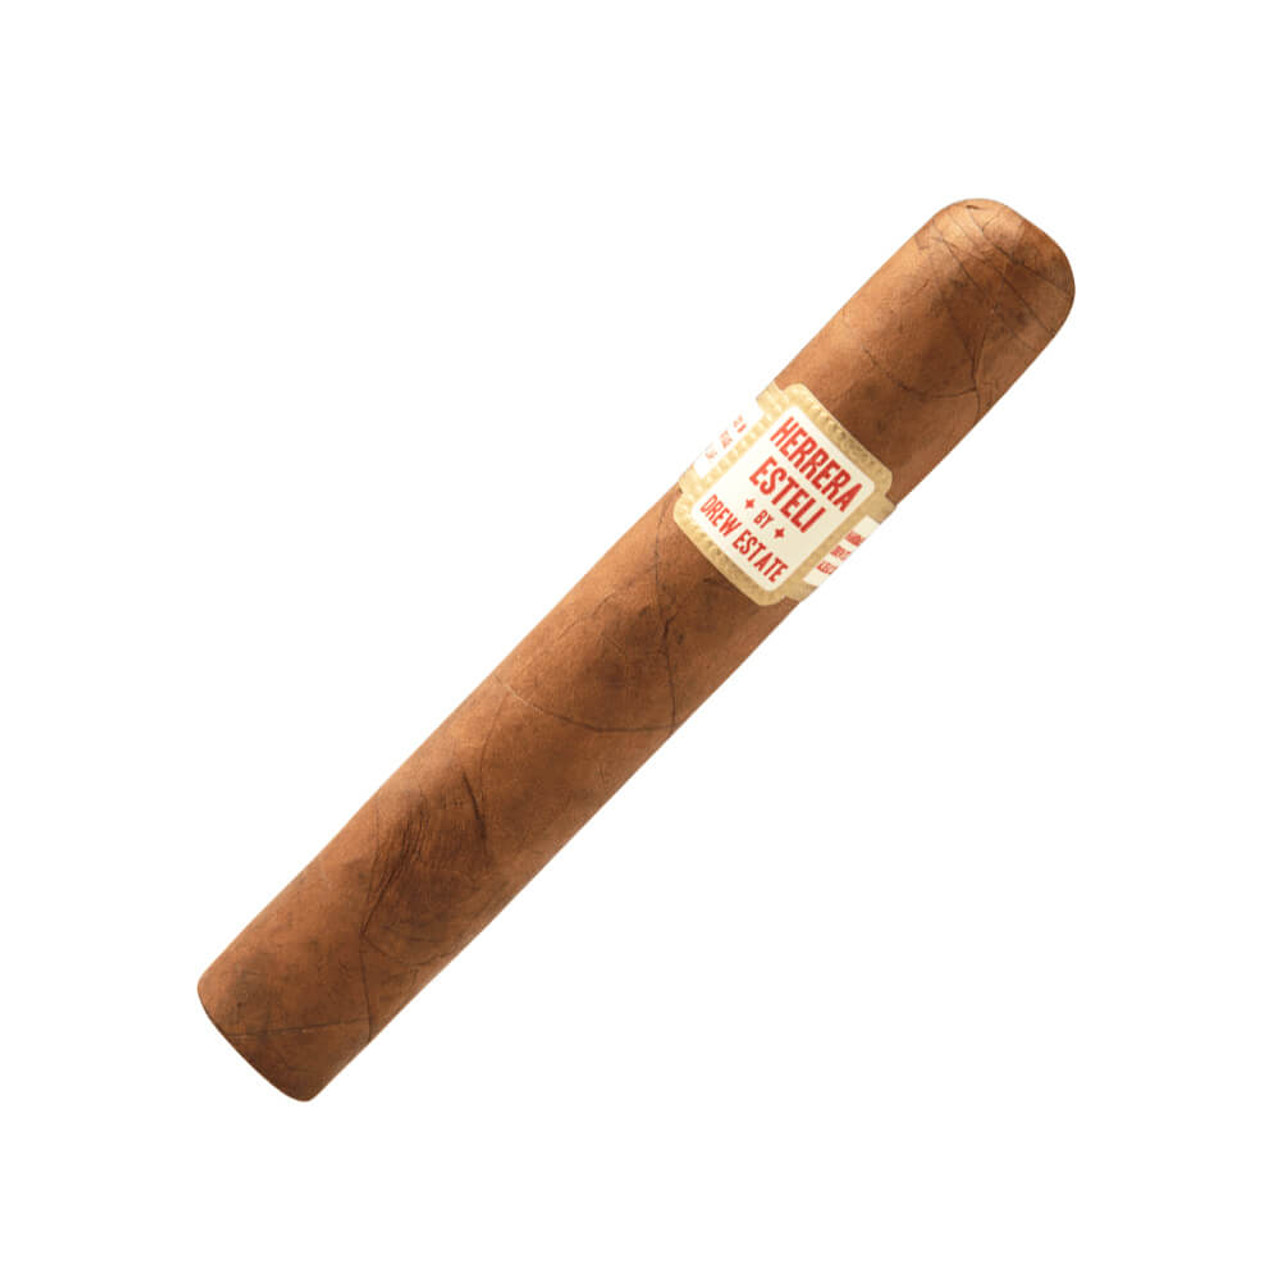 Herrera Esteli Habano Robusto Grande Cigars - 5.25 x 52 (Box of 25)